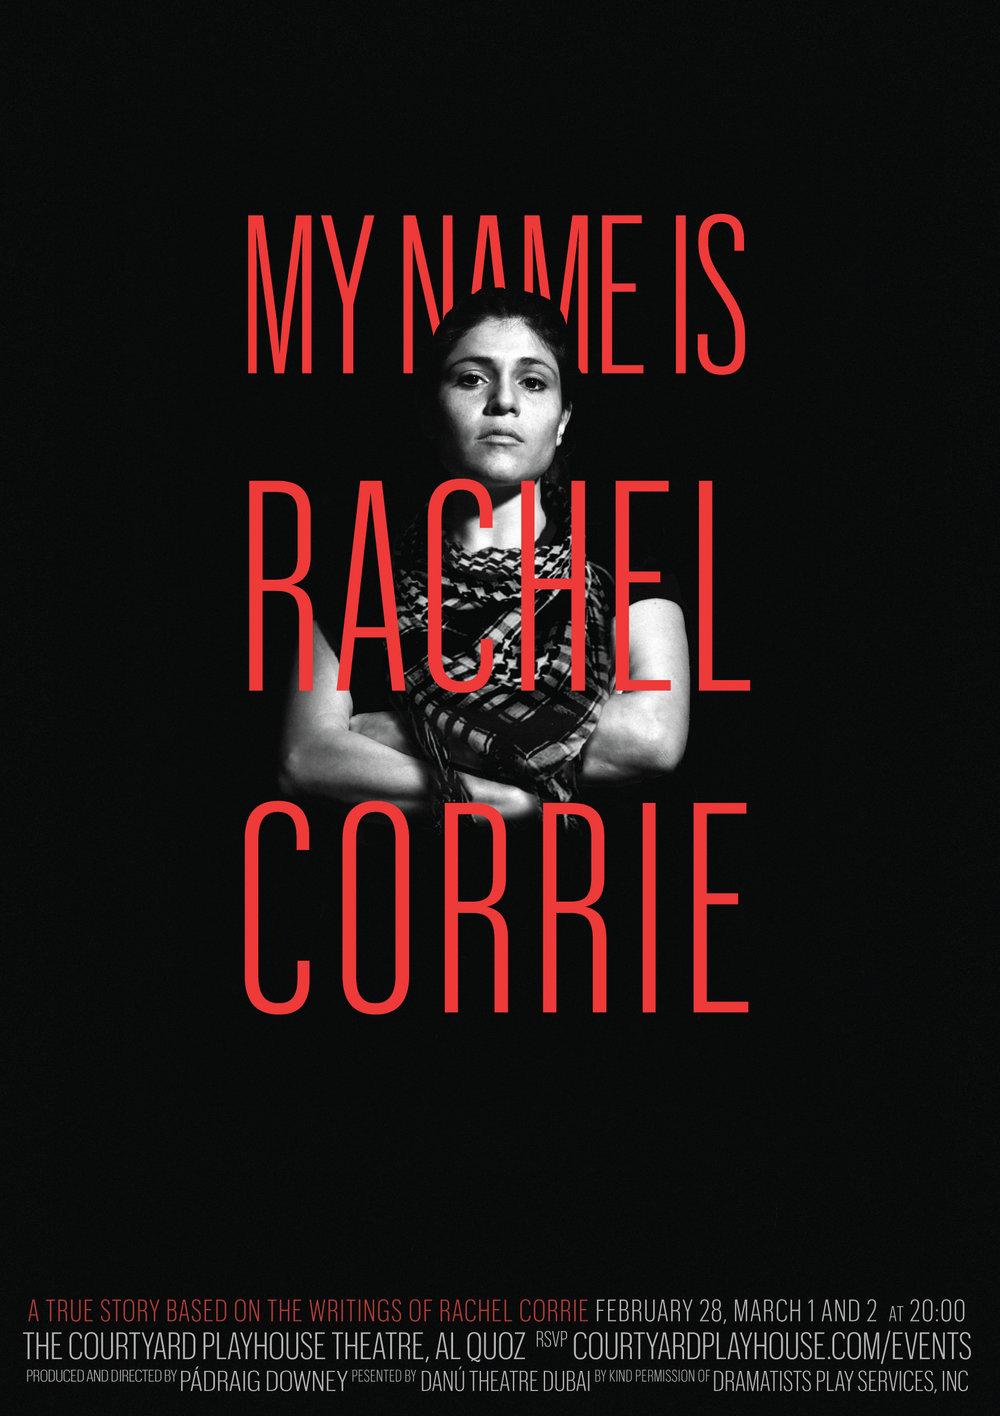 rachel-corrie-poster3.jpg